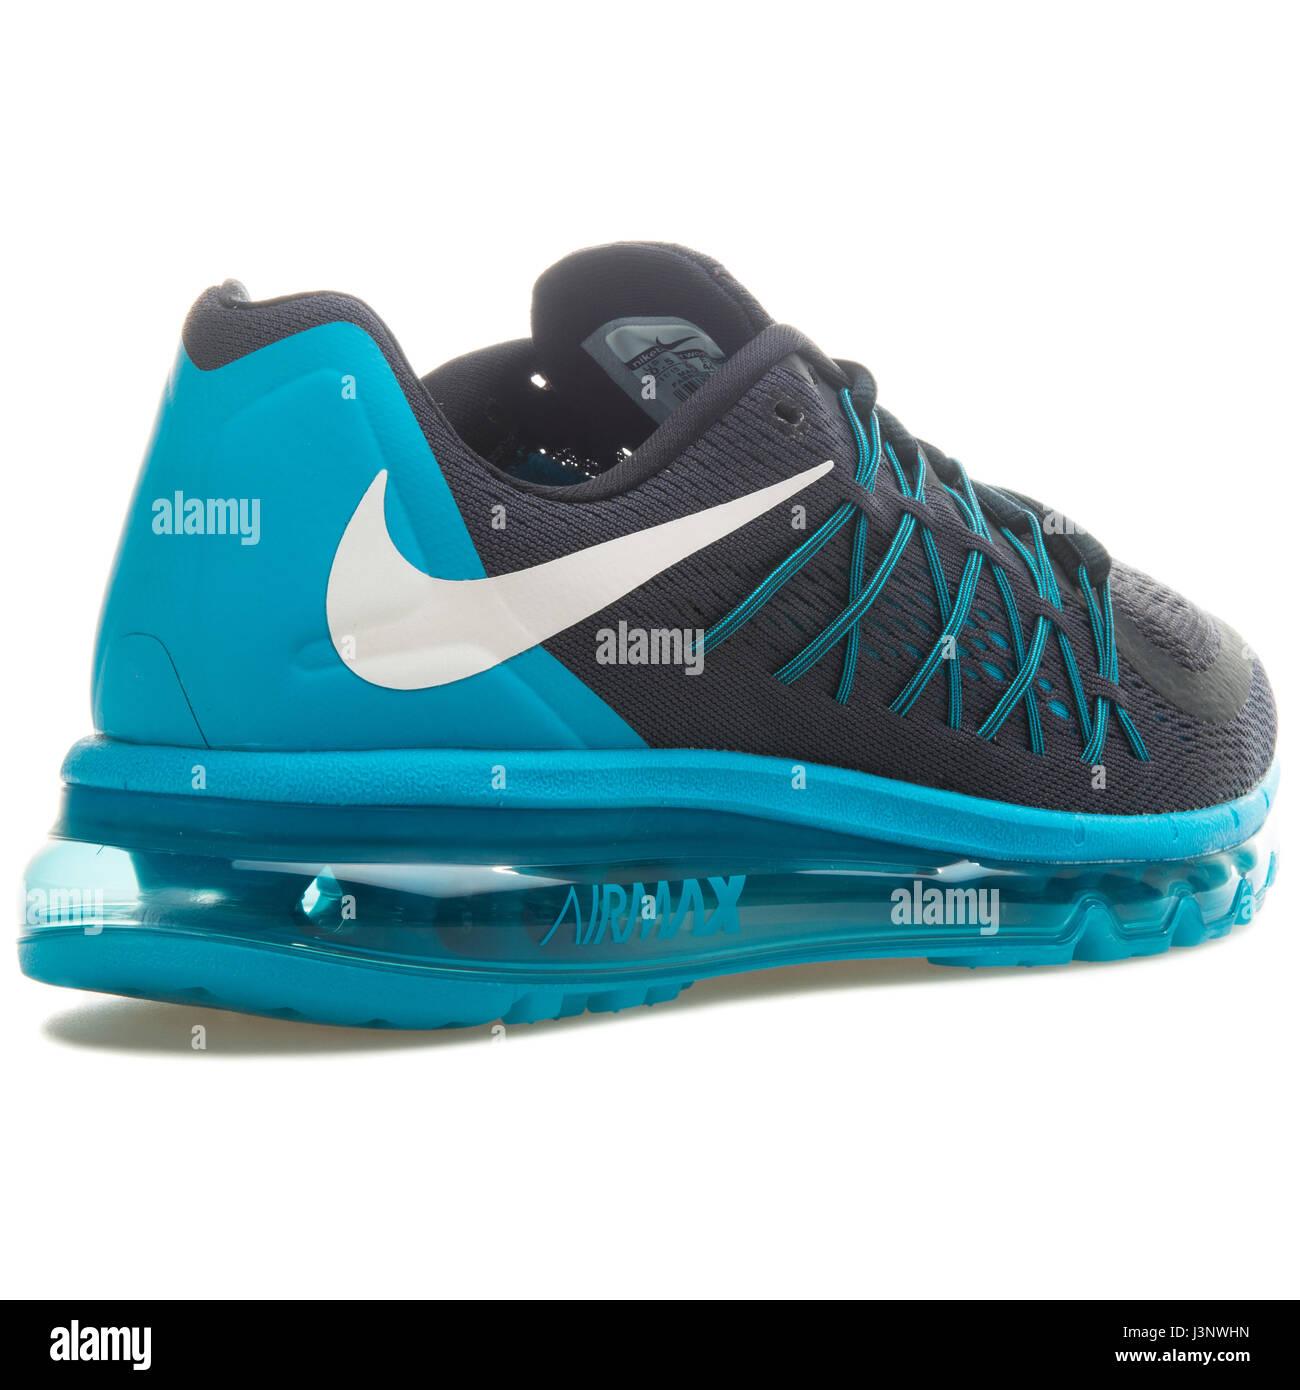 online retailer 9c3af a58bb Nike Air Max 2015 - 698902-402 - Stock Image